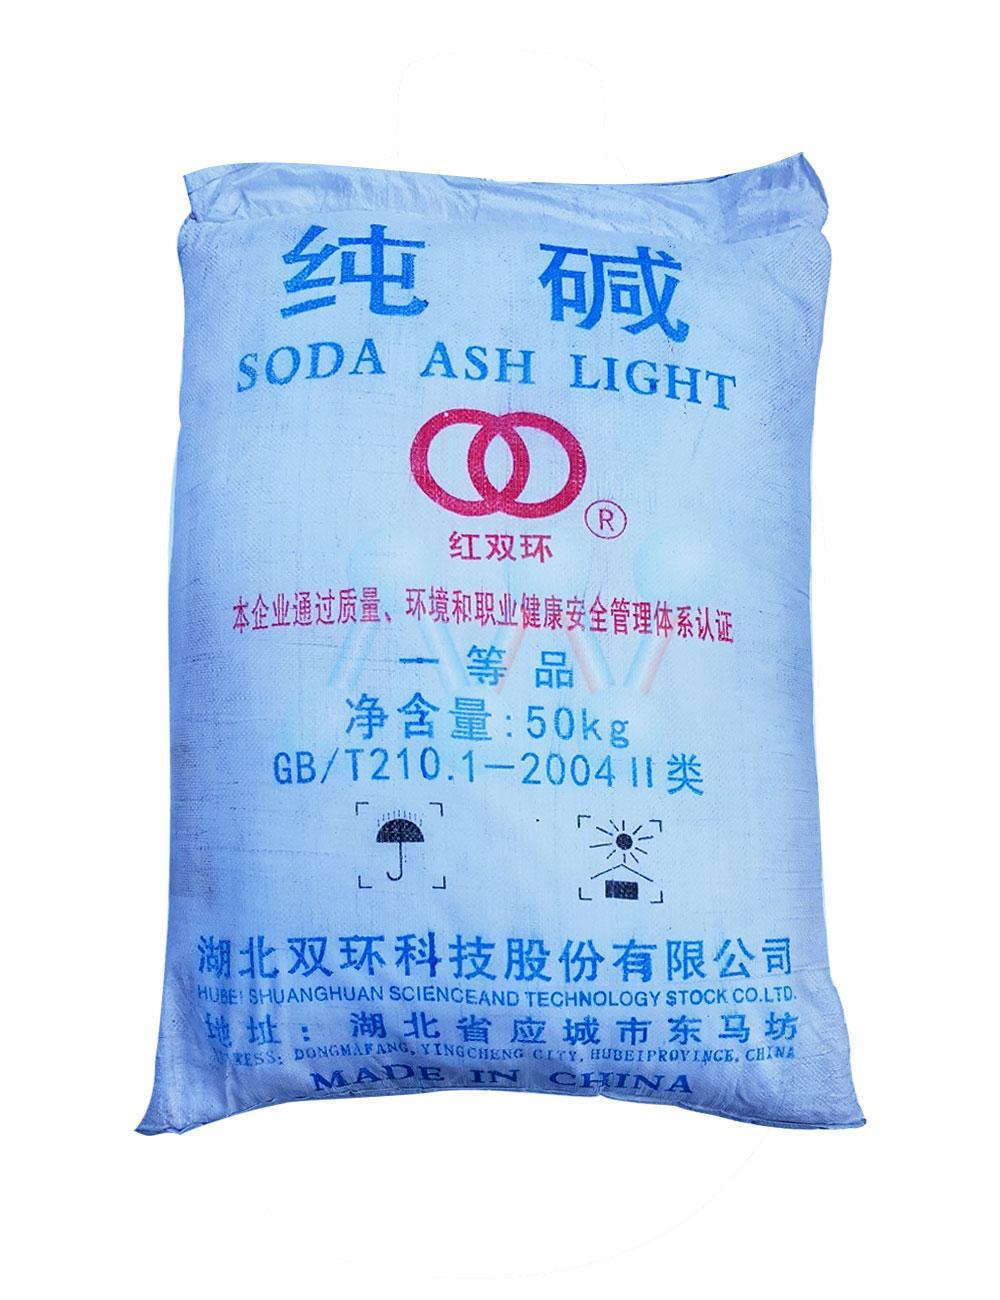 Soda ash light - Na2CO3